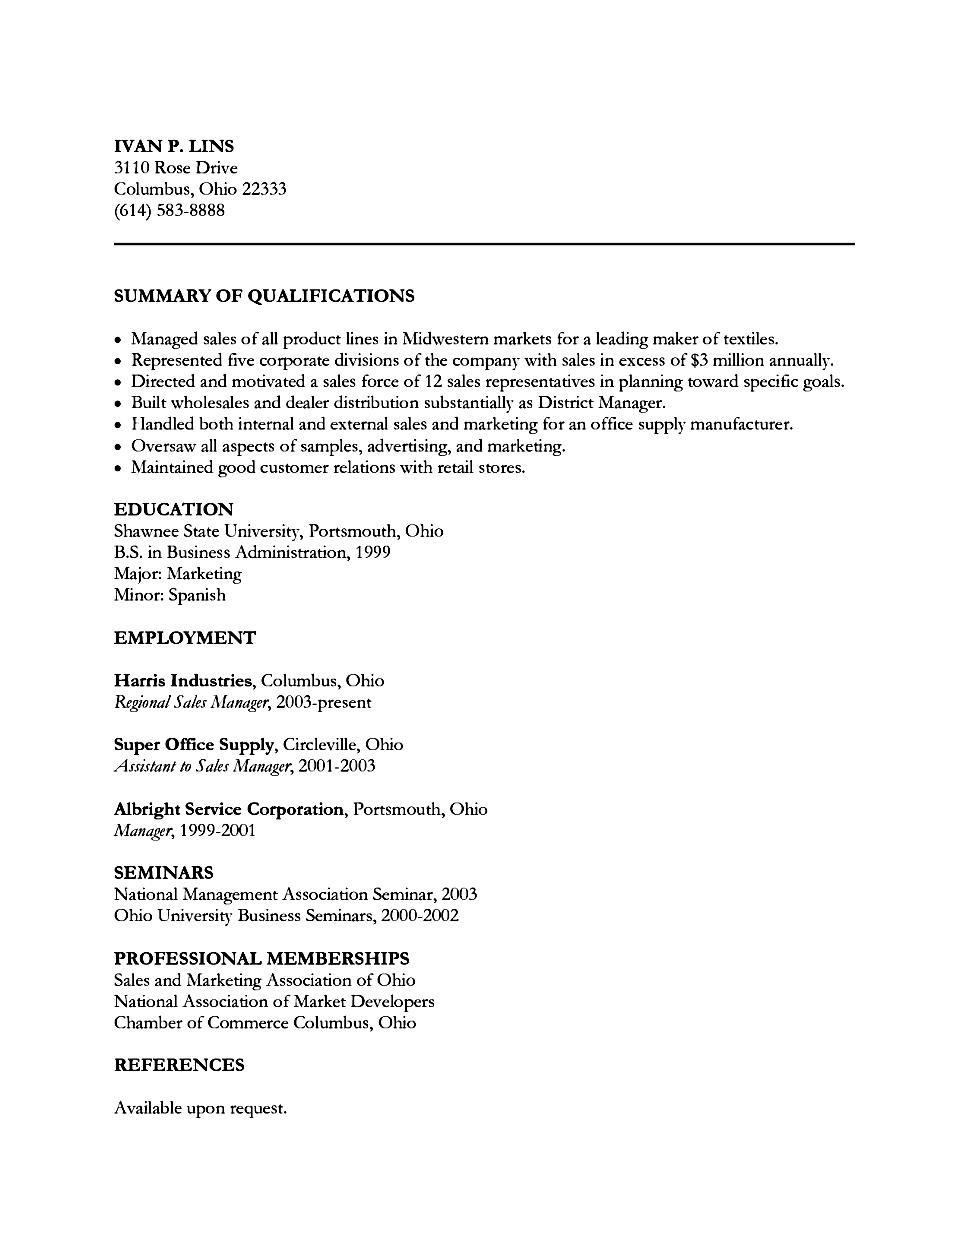 executive resume samples free